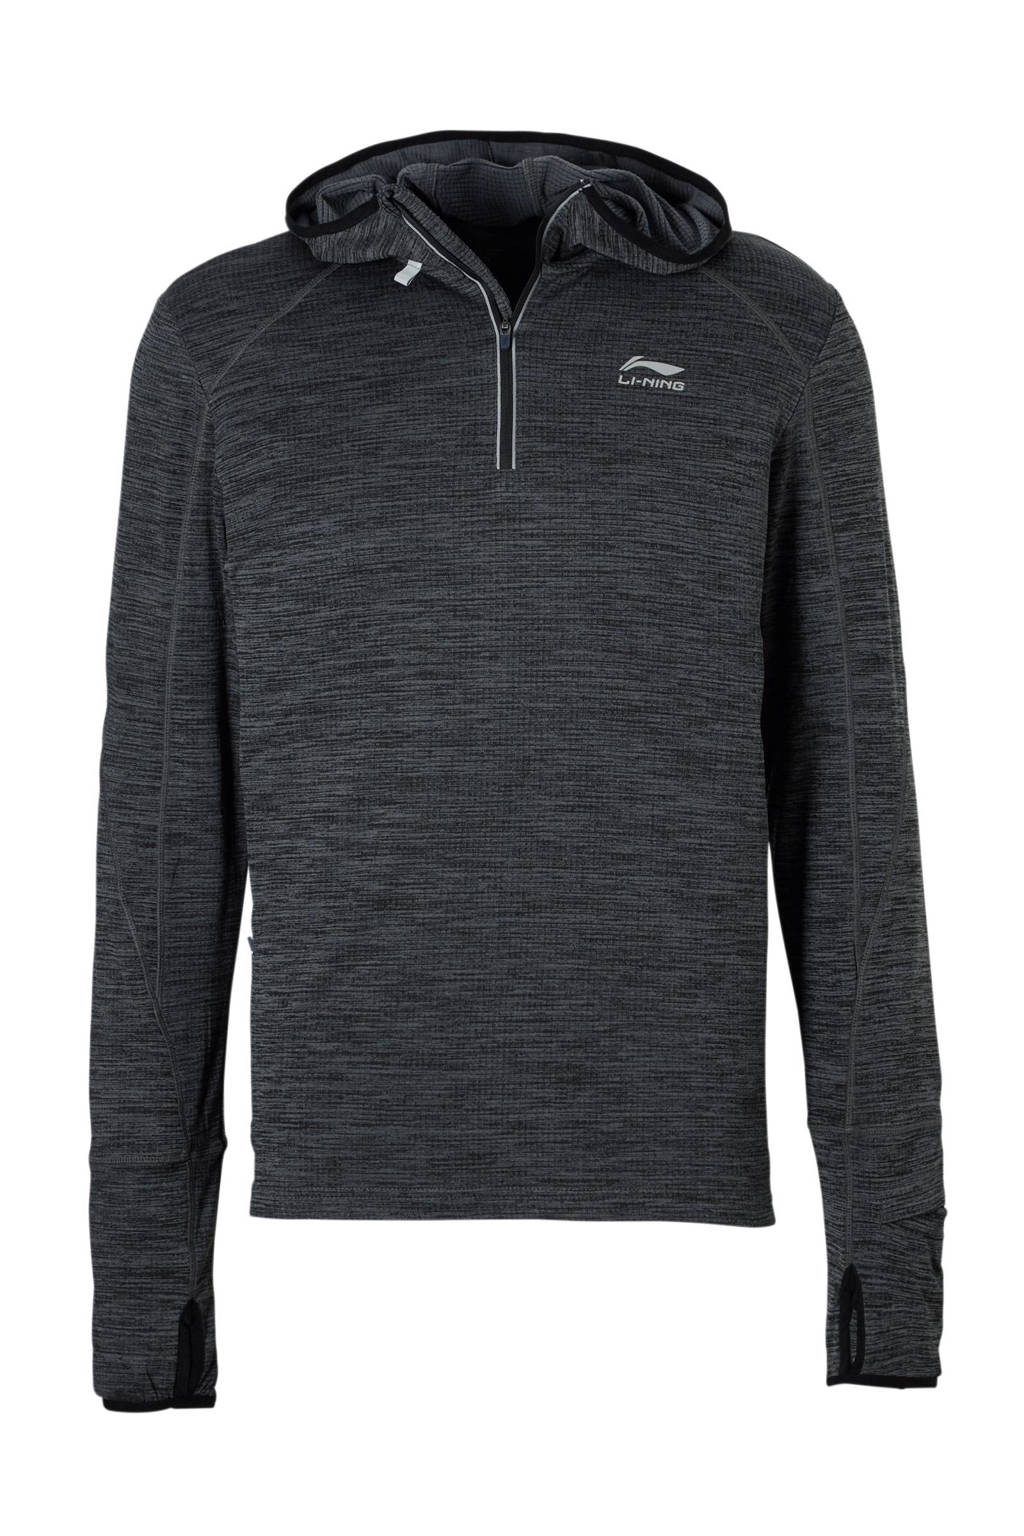 Li-Ning   hardloopsweater antraciet, Antraciet